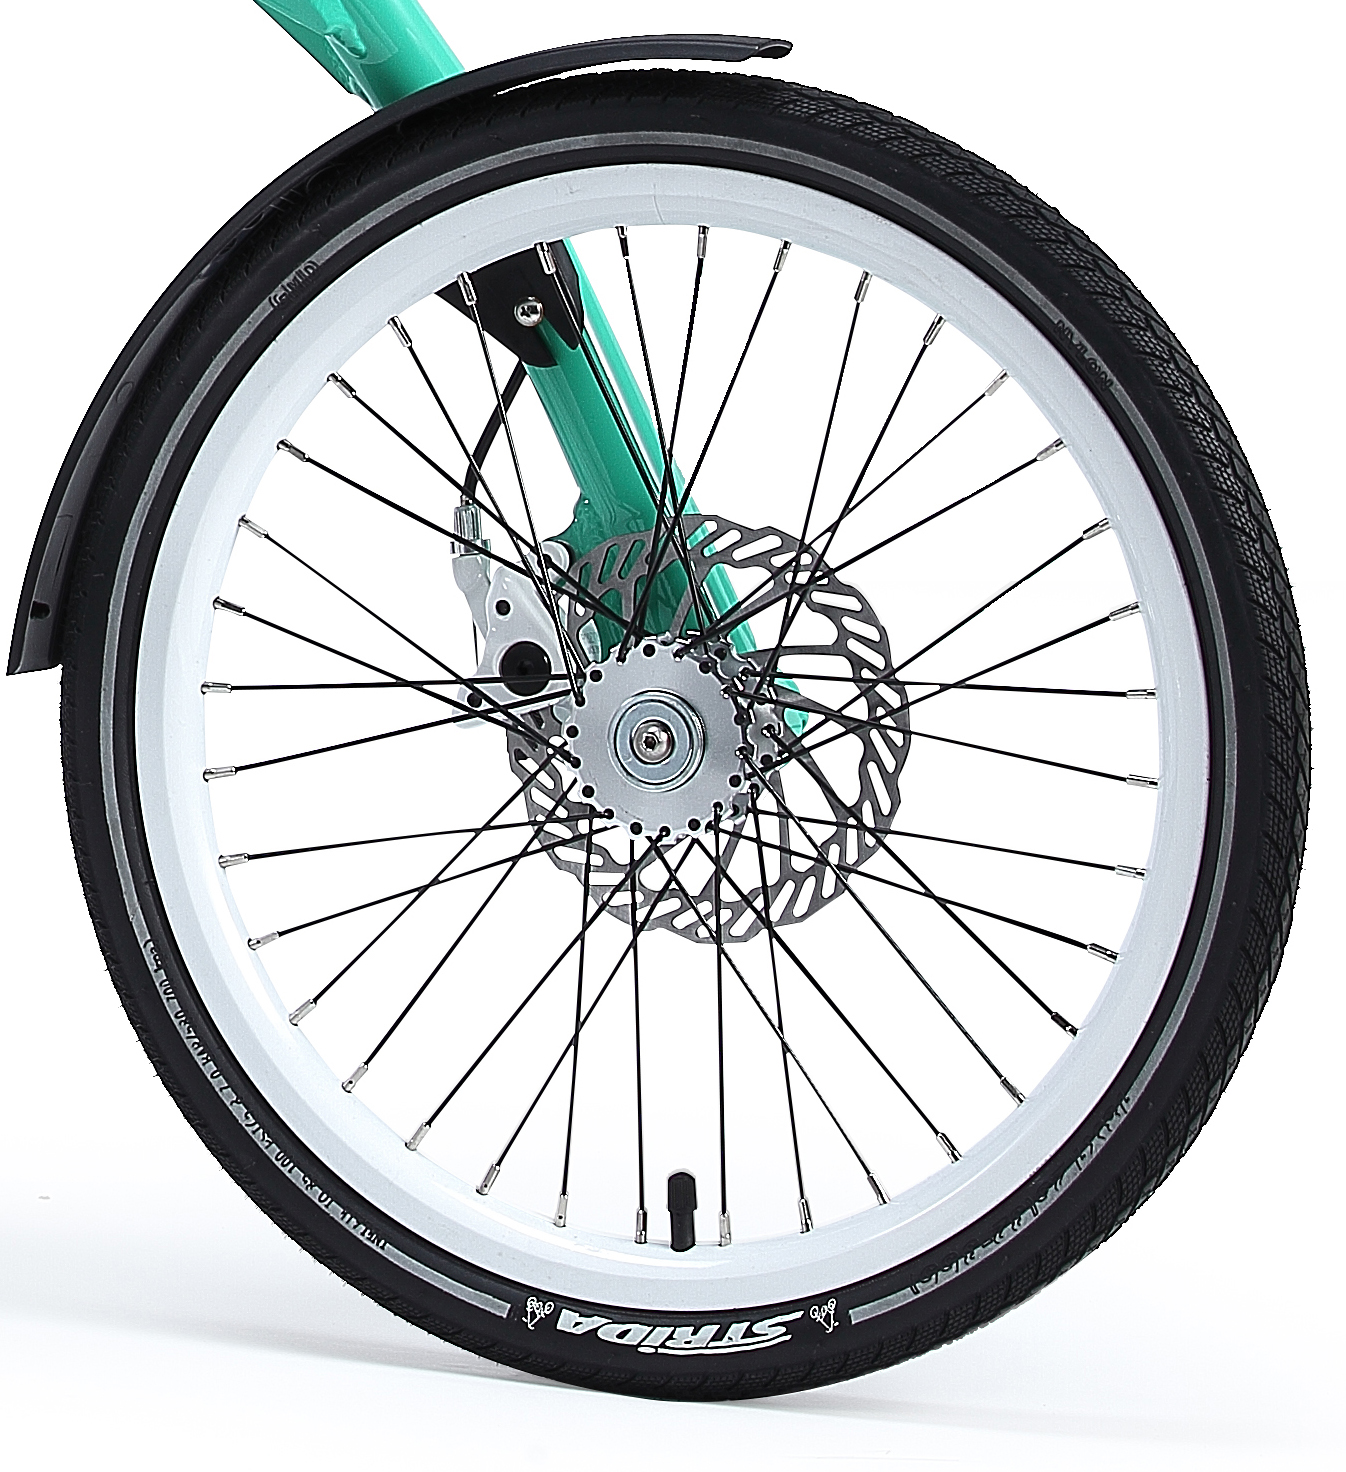 18 Inch Tires >> 18 Inch White Aluminium Strida Wheel Rim Set With Brake Discs Freewheel Assembled Without Tires